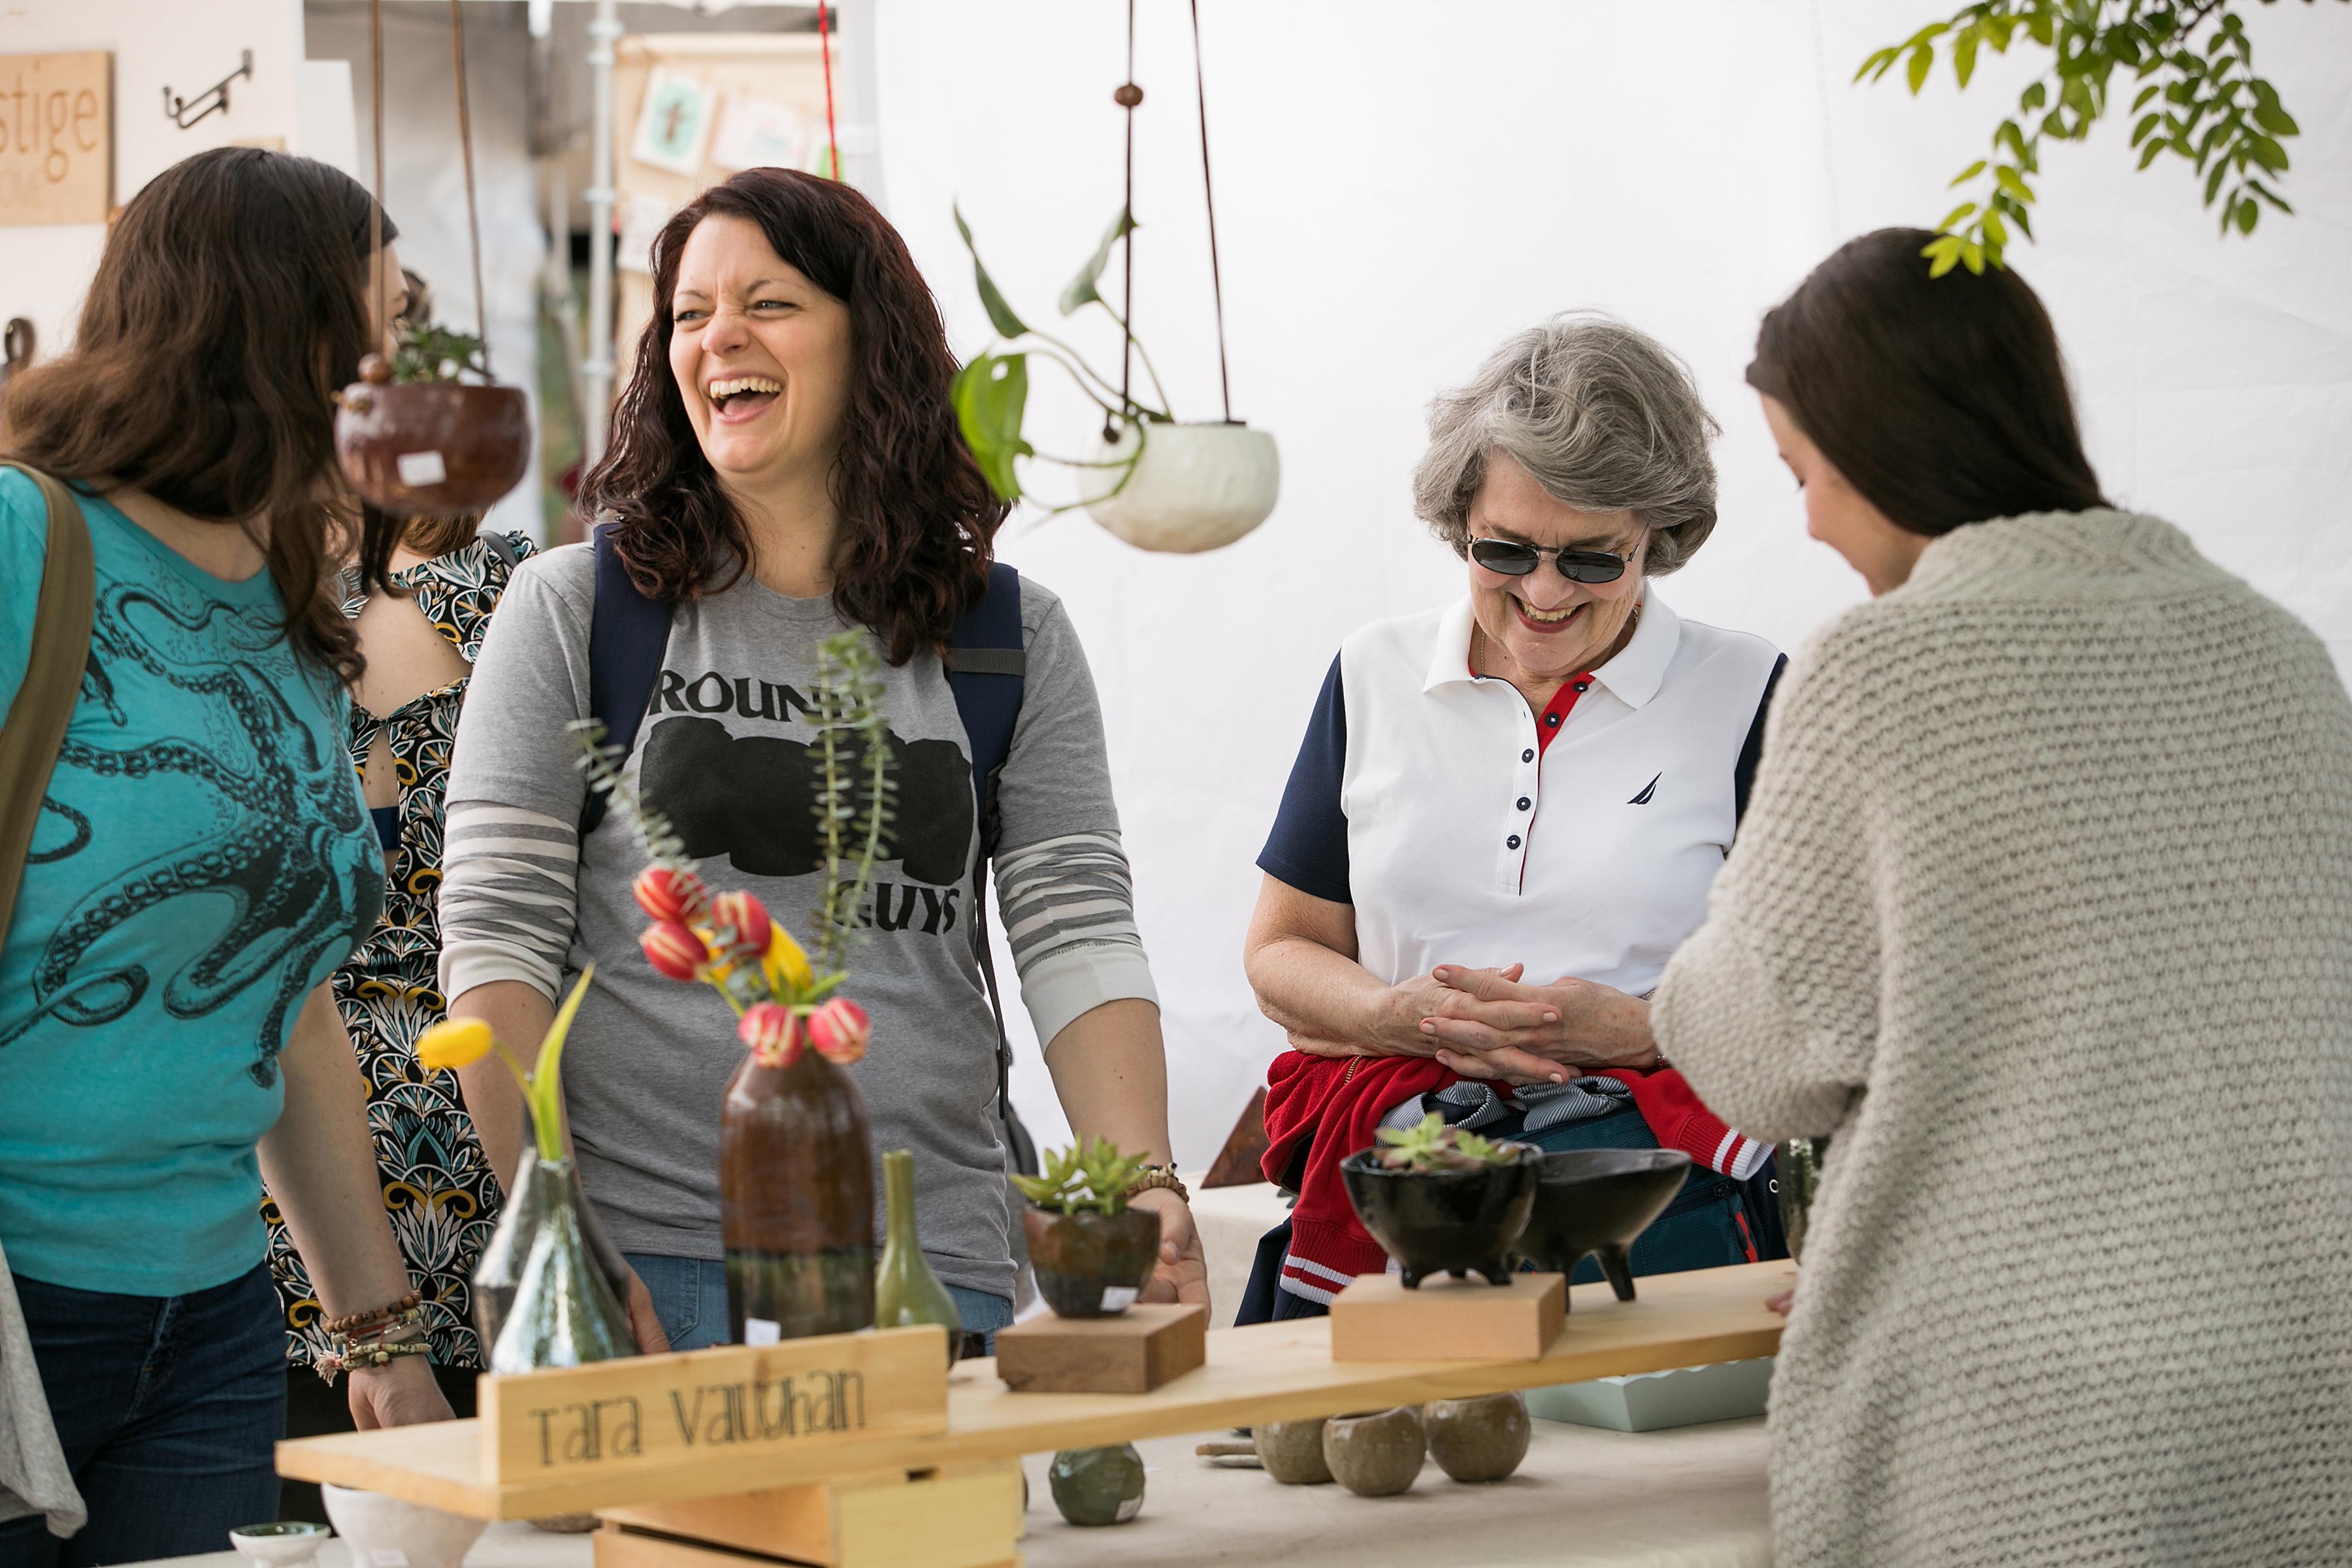 Shoppers at the Art Star Craft Bazaar